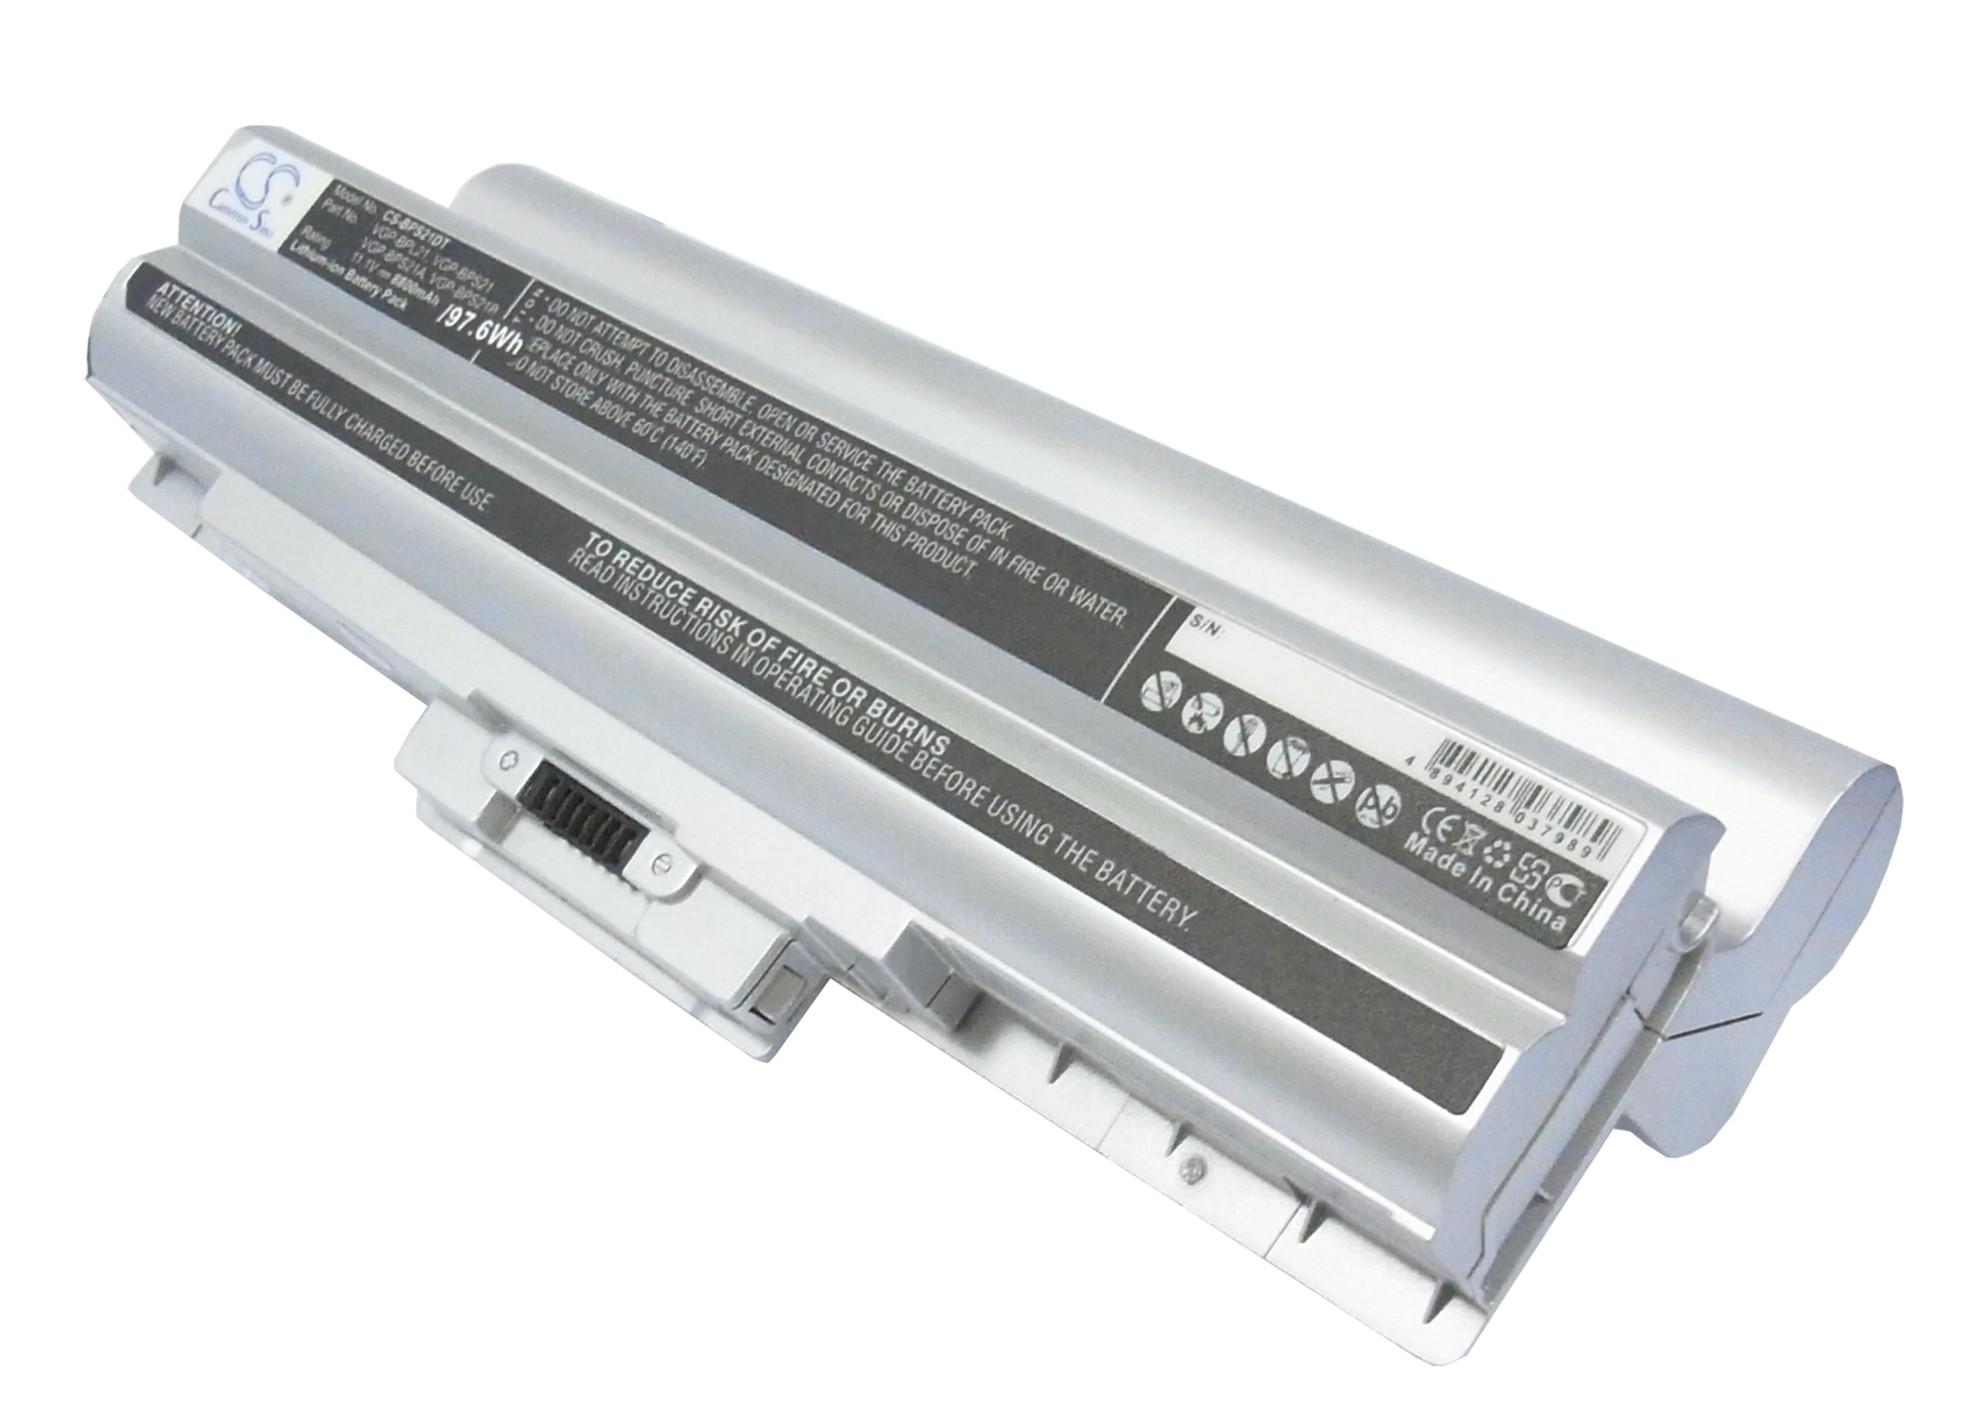 Cameron Sino baterie do notebooků pro SONY VAIO VPCF11Z1E 11.1V Li-ion 8800mAh stříbrná - neoriginální